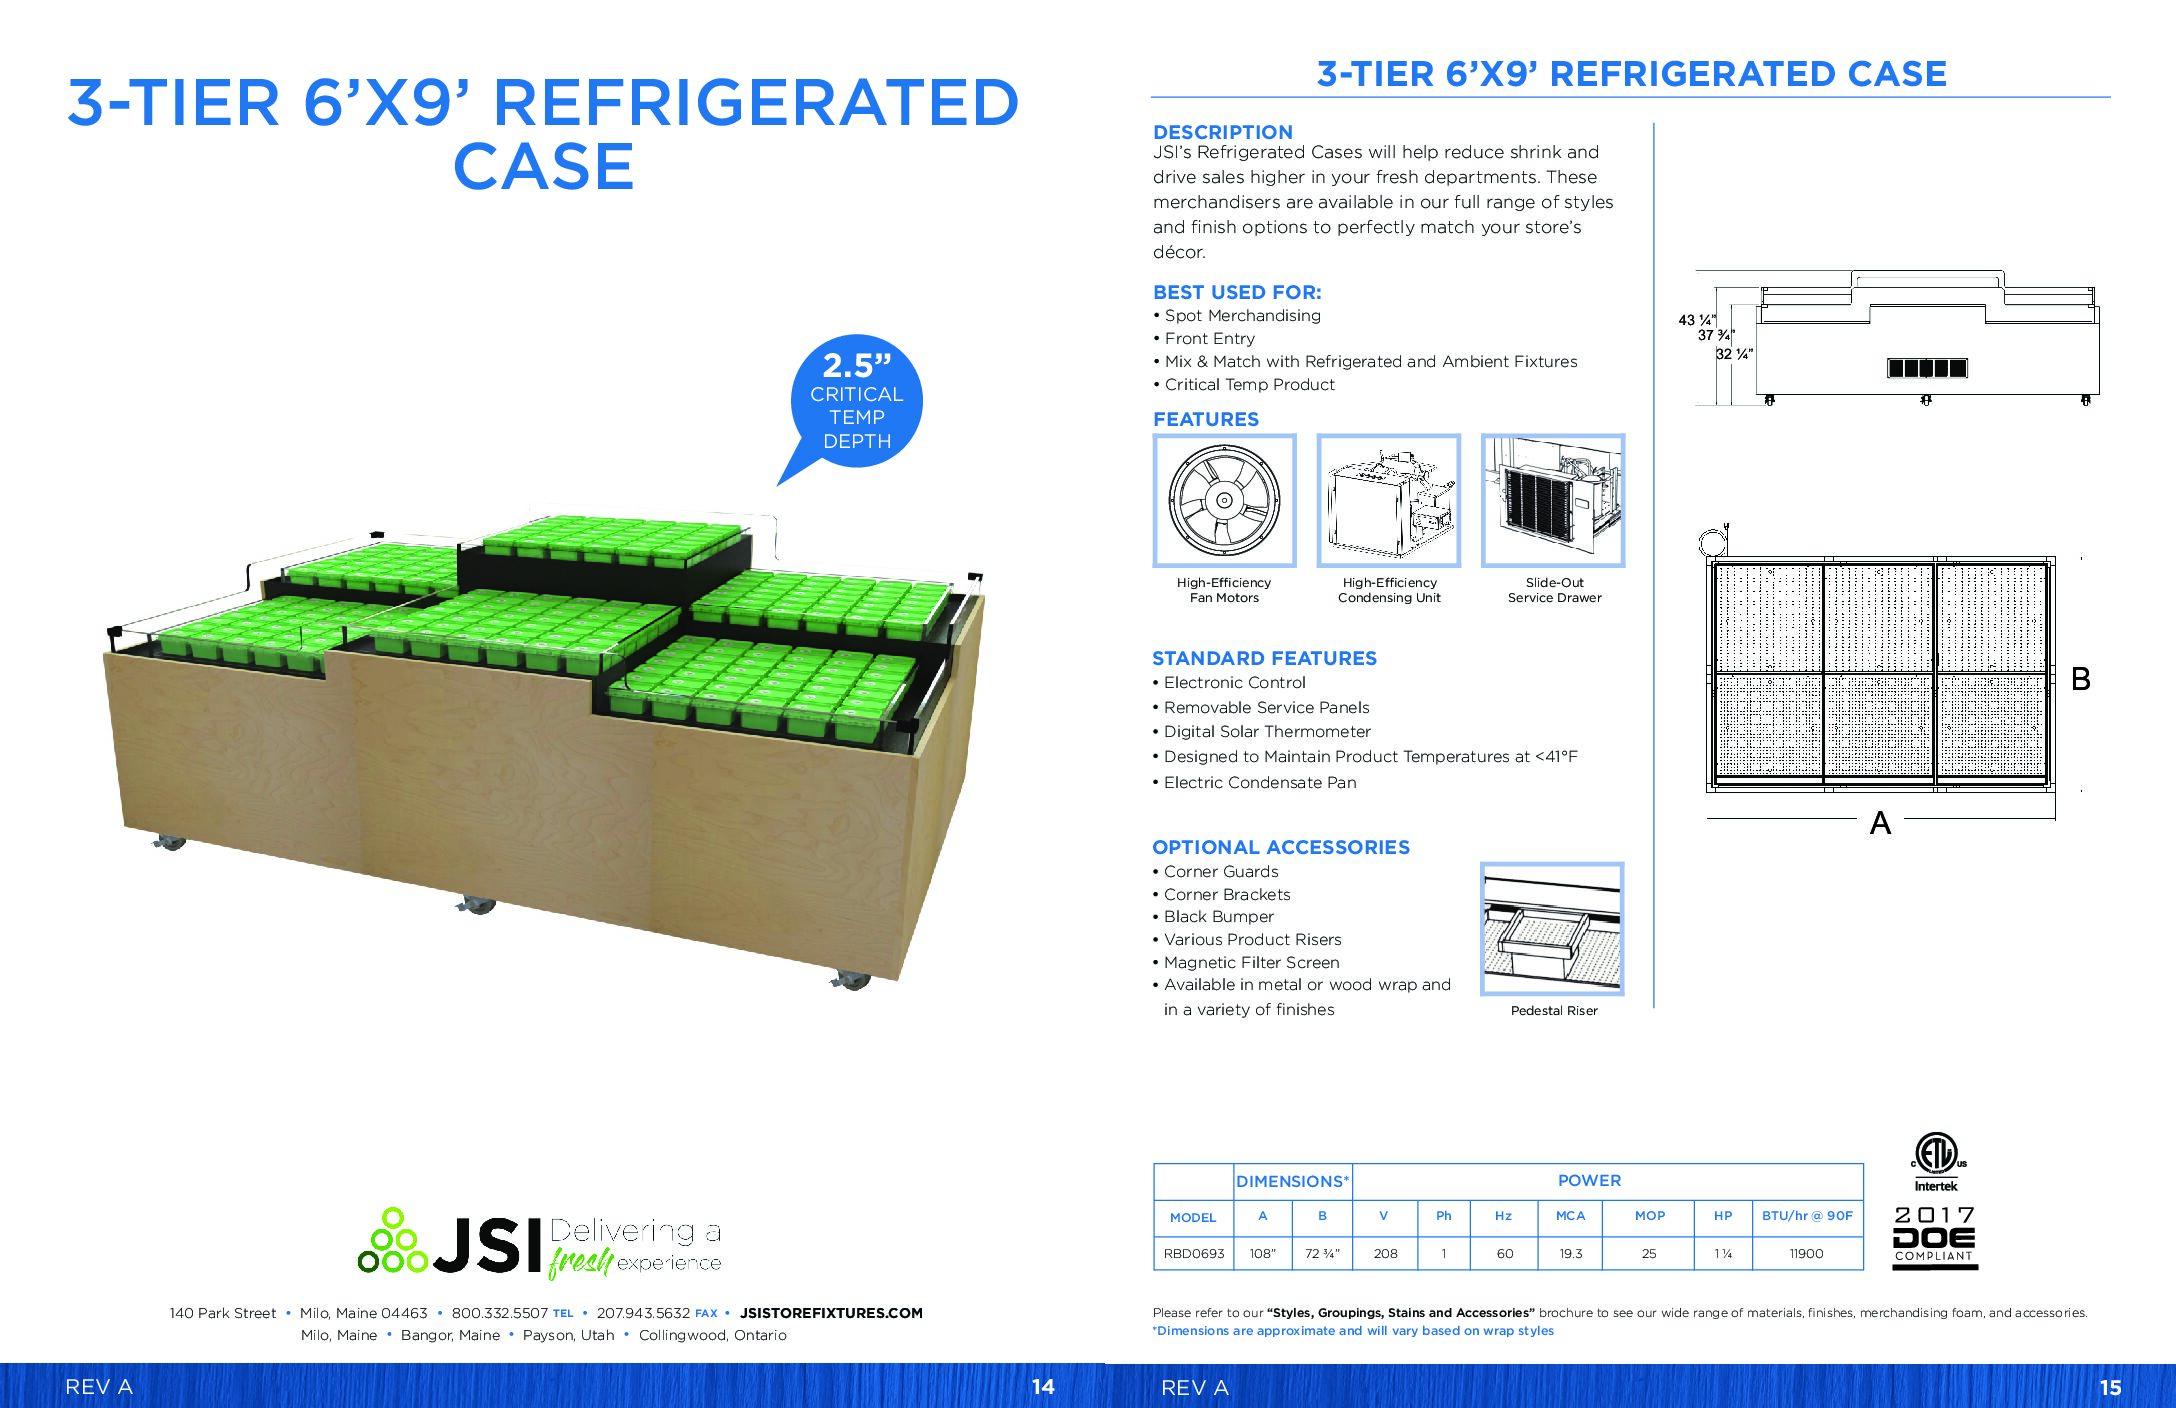 3-Tier 6x9 Refrigerated Case (PDF)